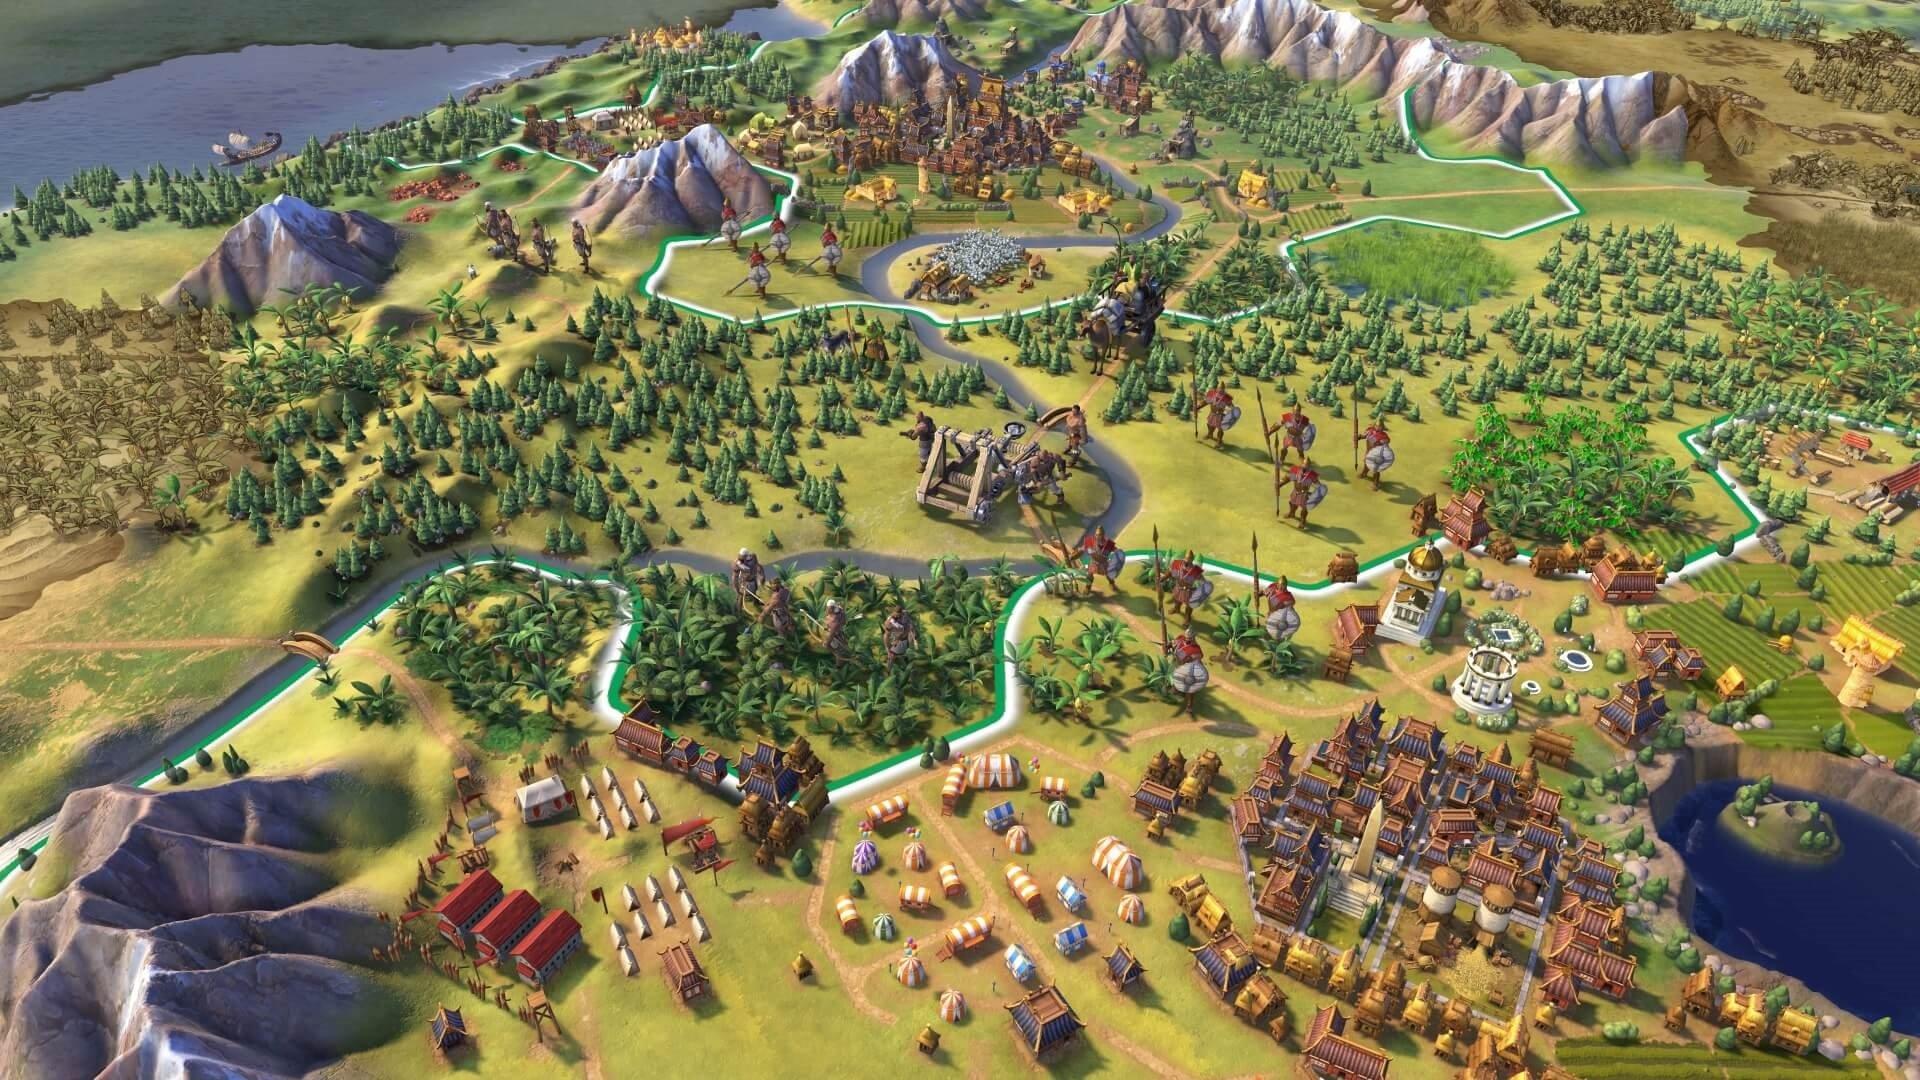 EPİC GAMES'TEN HAFTANIN ÜCRETSİZ OYUNU: CİVİLATİON 6